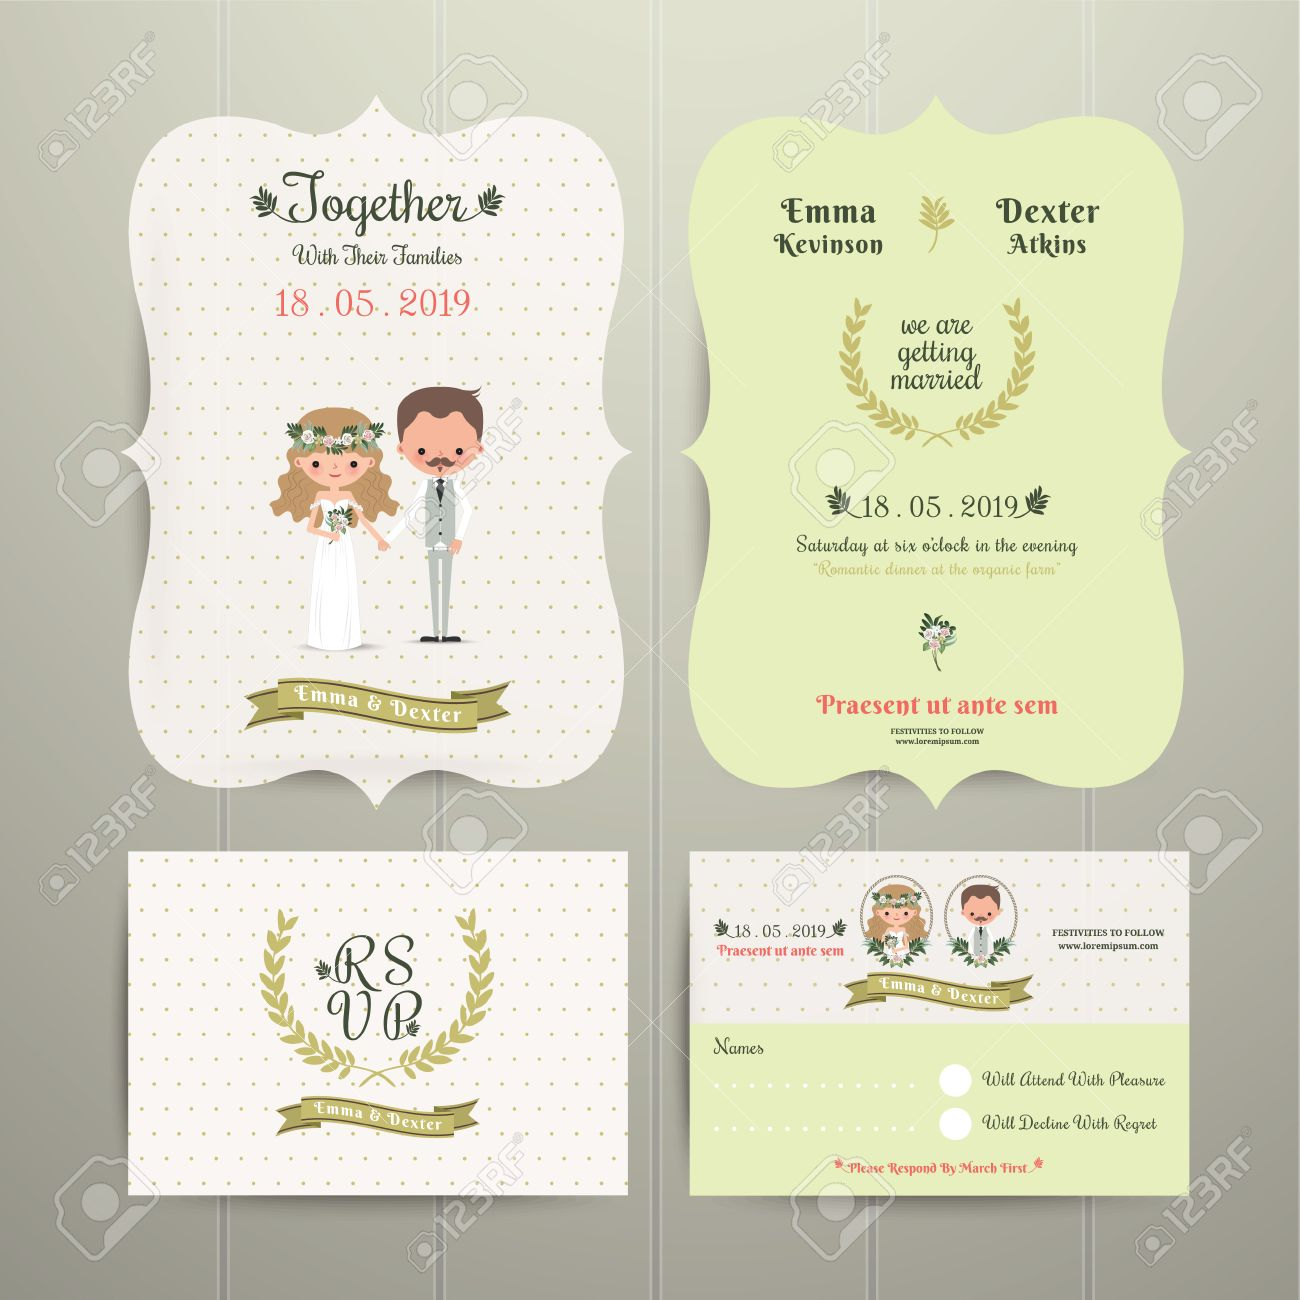 Bride Groom Cartoon Ferme Romantique Wedding Invitation Card Et